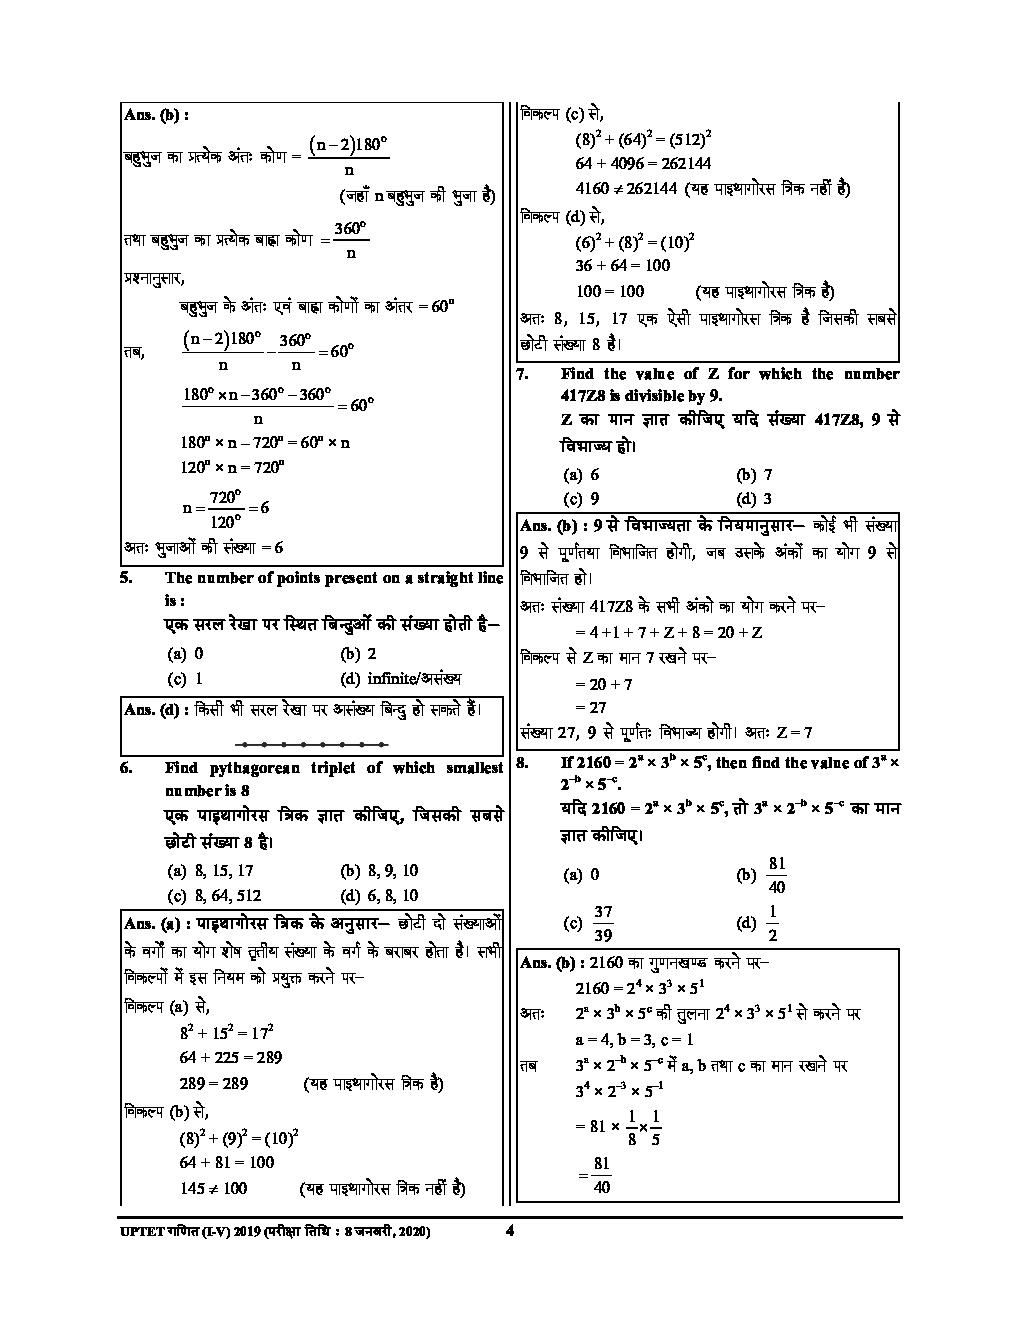 UP TET/CTET गणित सॉल्व्ड पेपर्स परीक्षा ज्ञान कोष Paper-I (2020-21) - Page 5